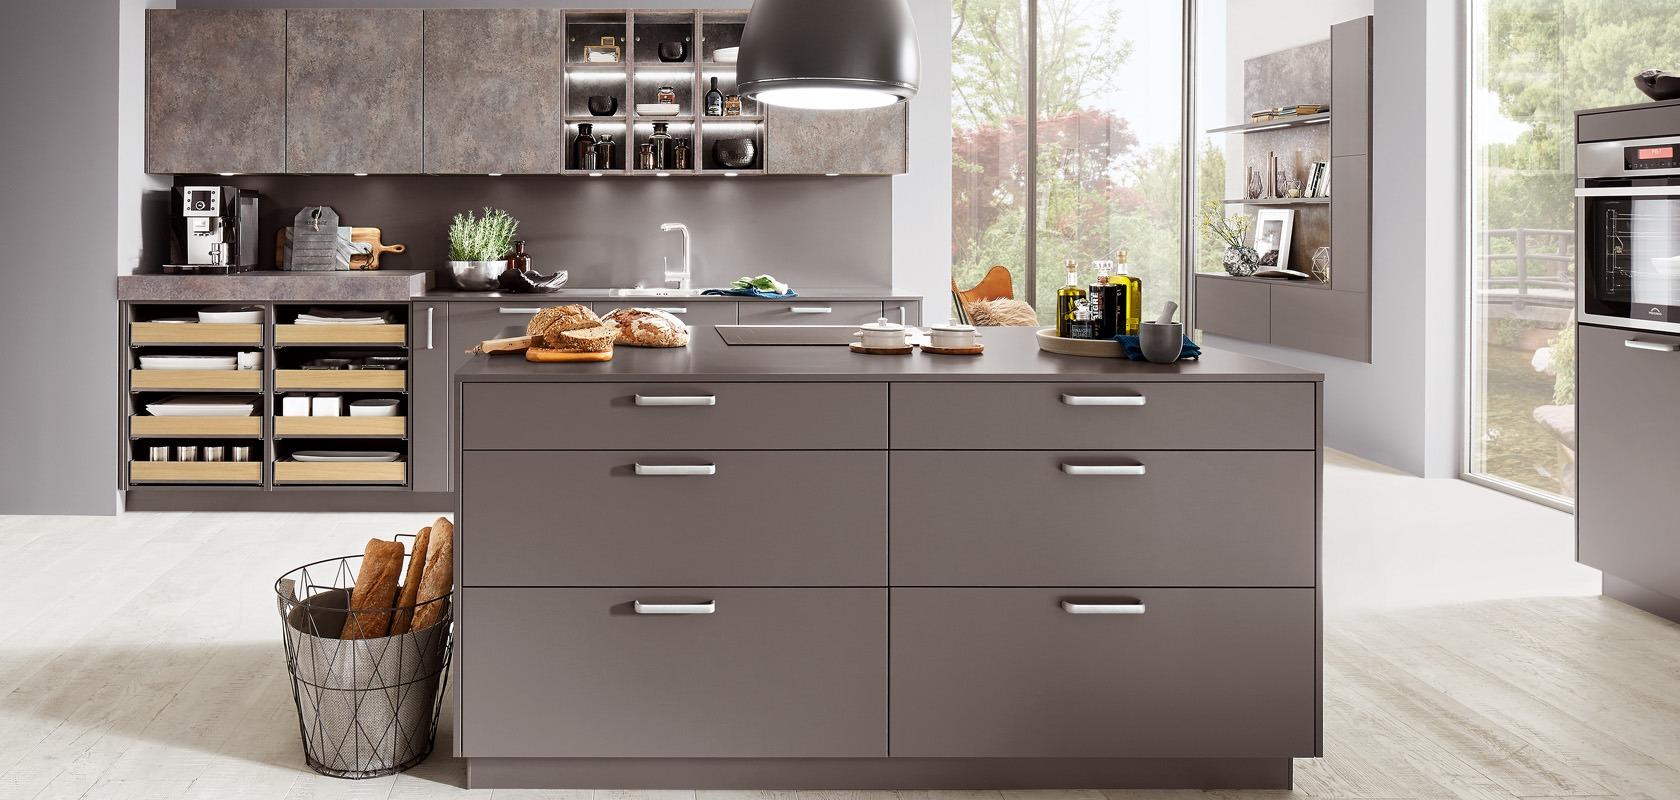 Cuisine Design – Touch 334